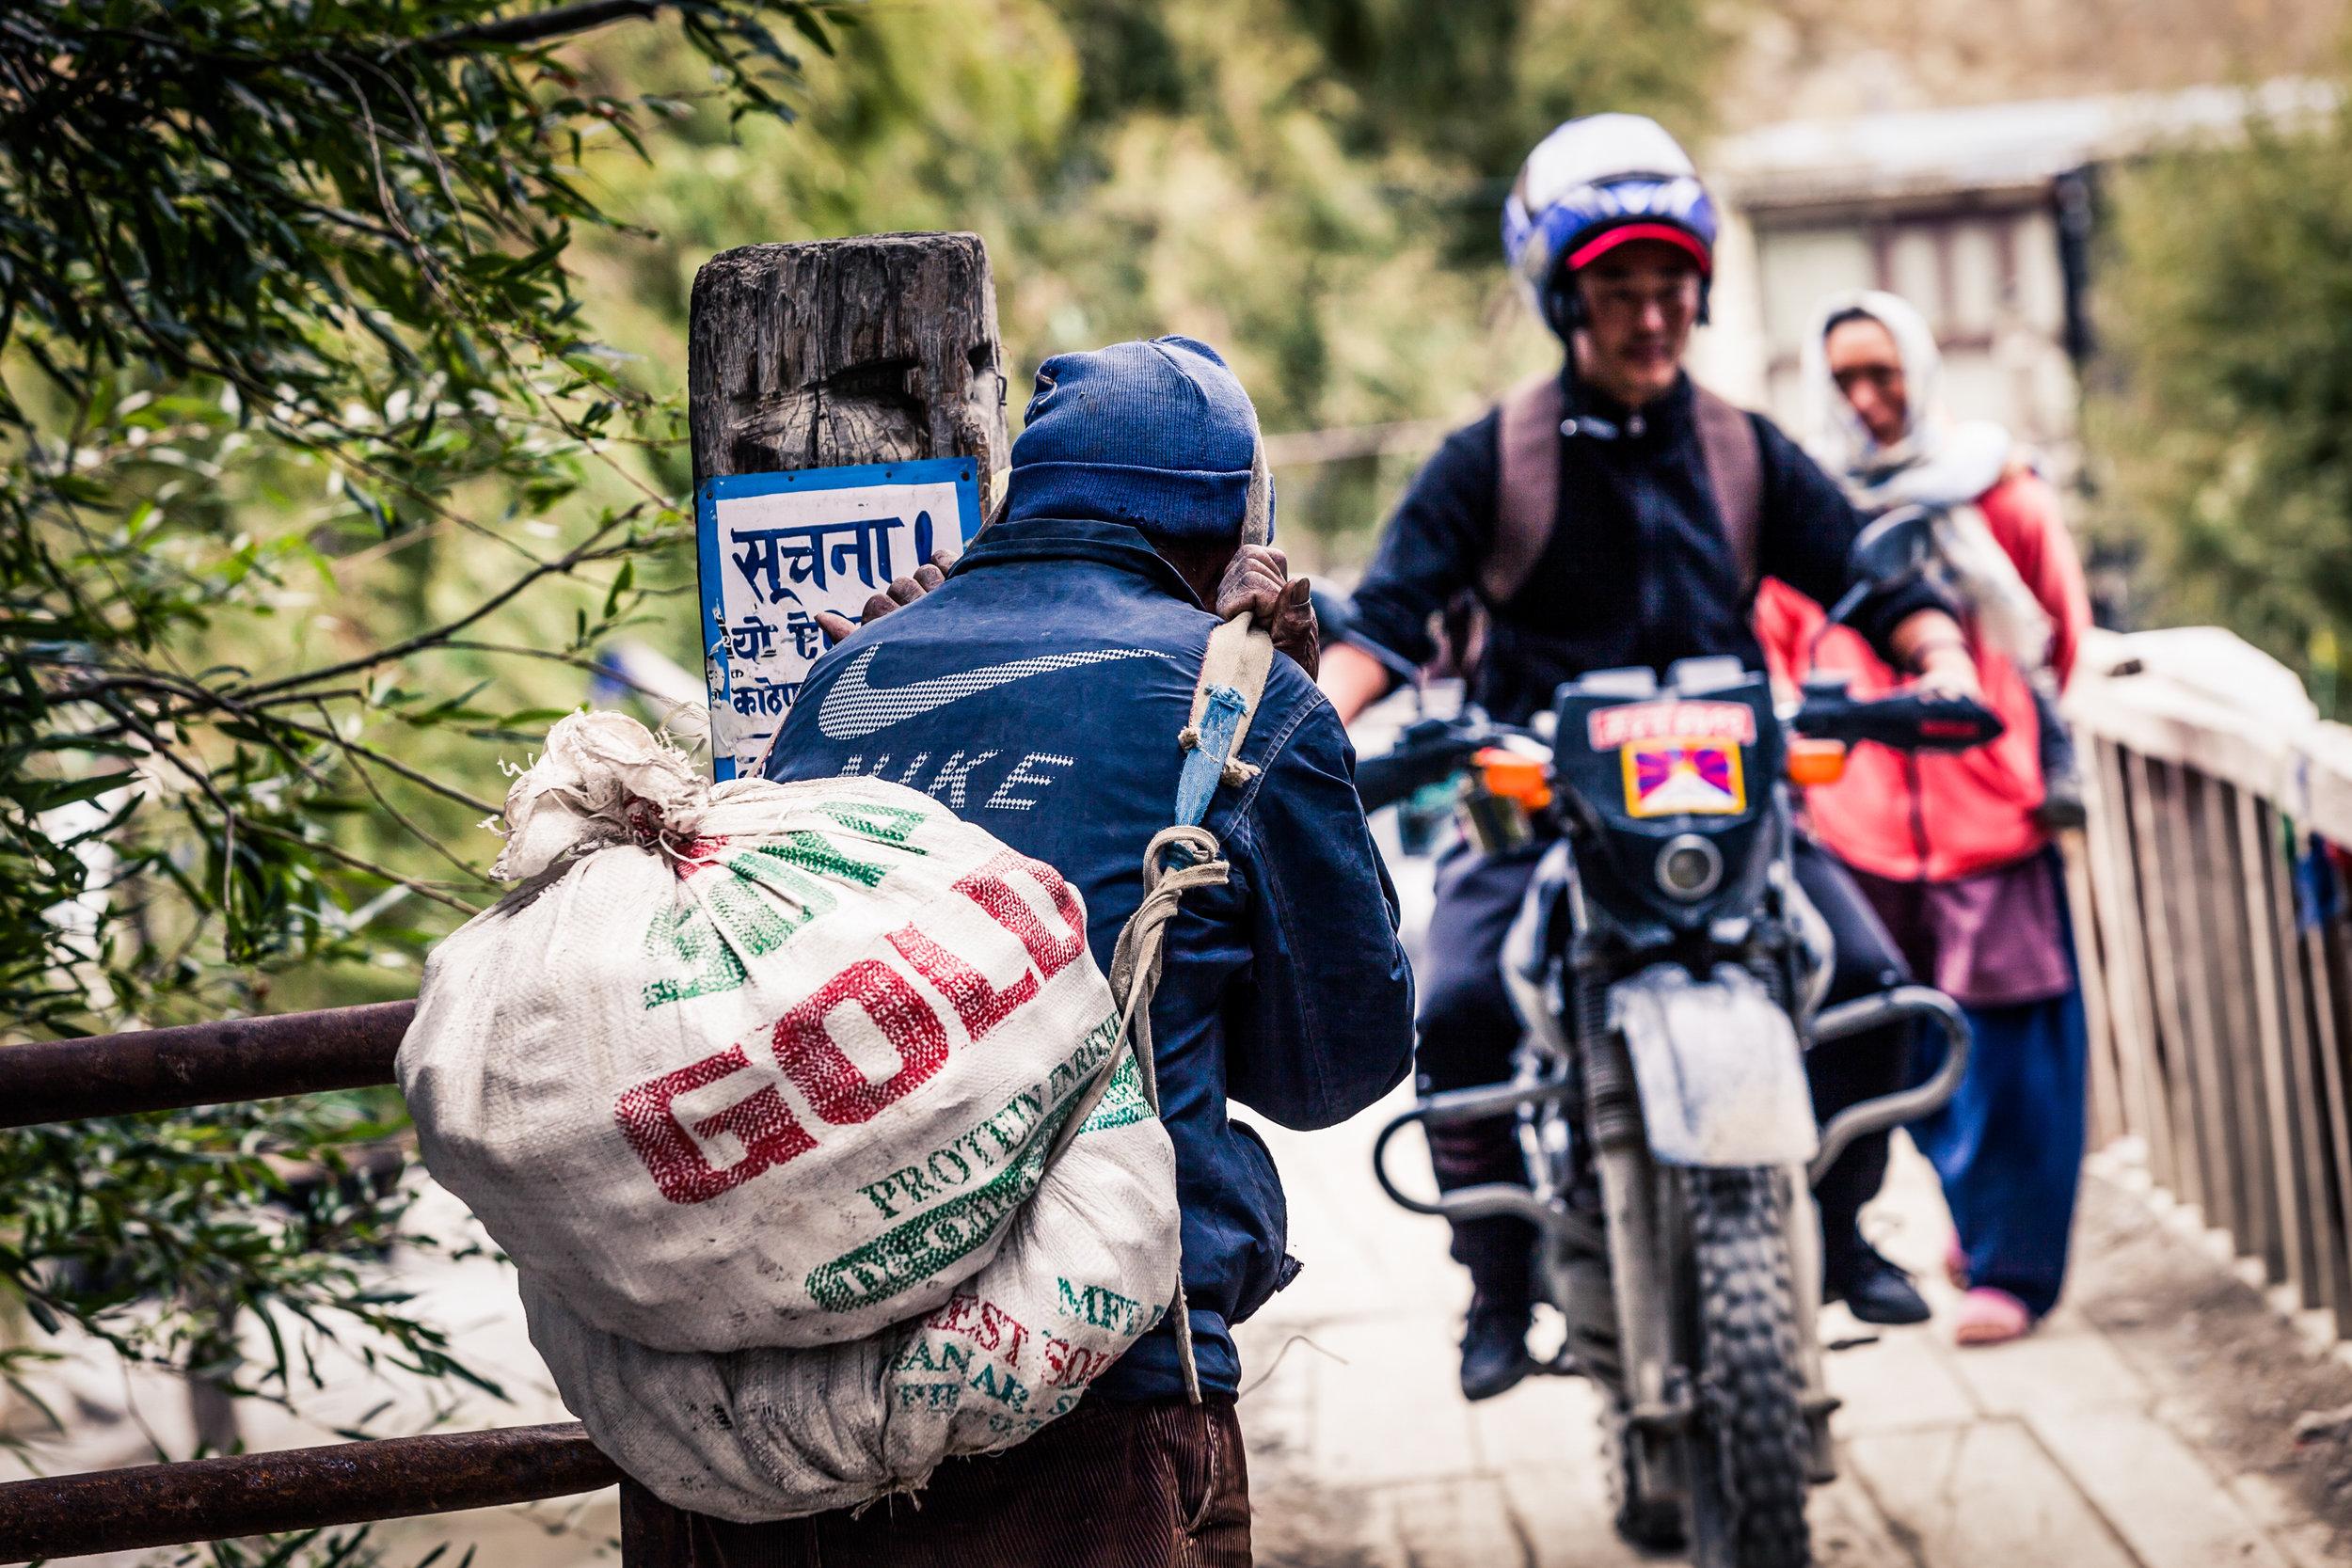 TWHMC-nepal-motorcycle-adventure-2016-0781-2.jpg